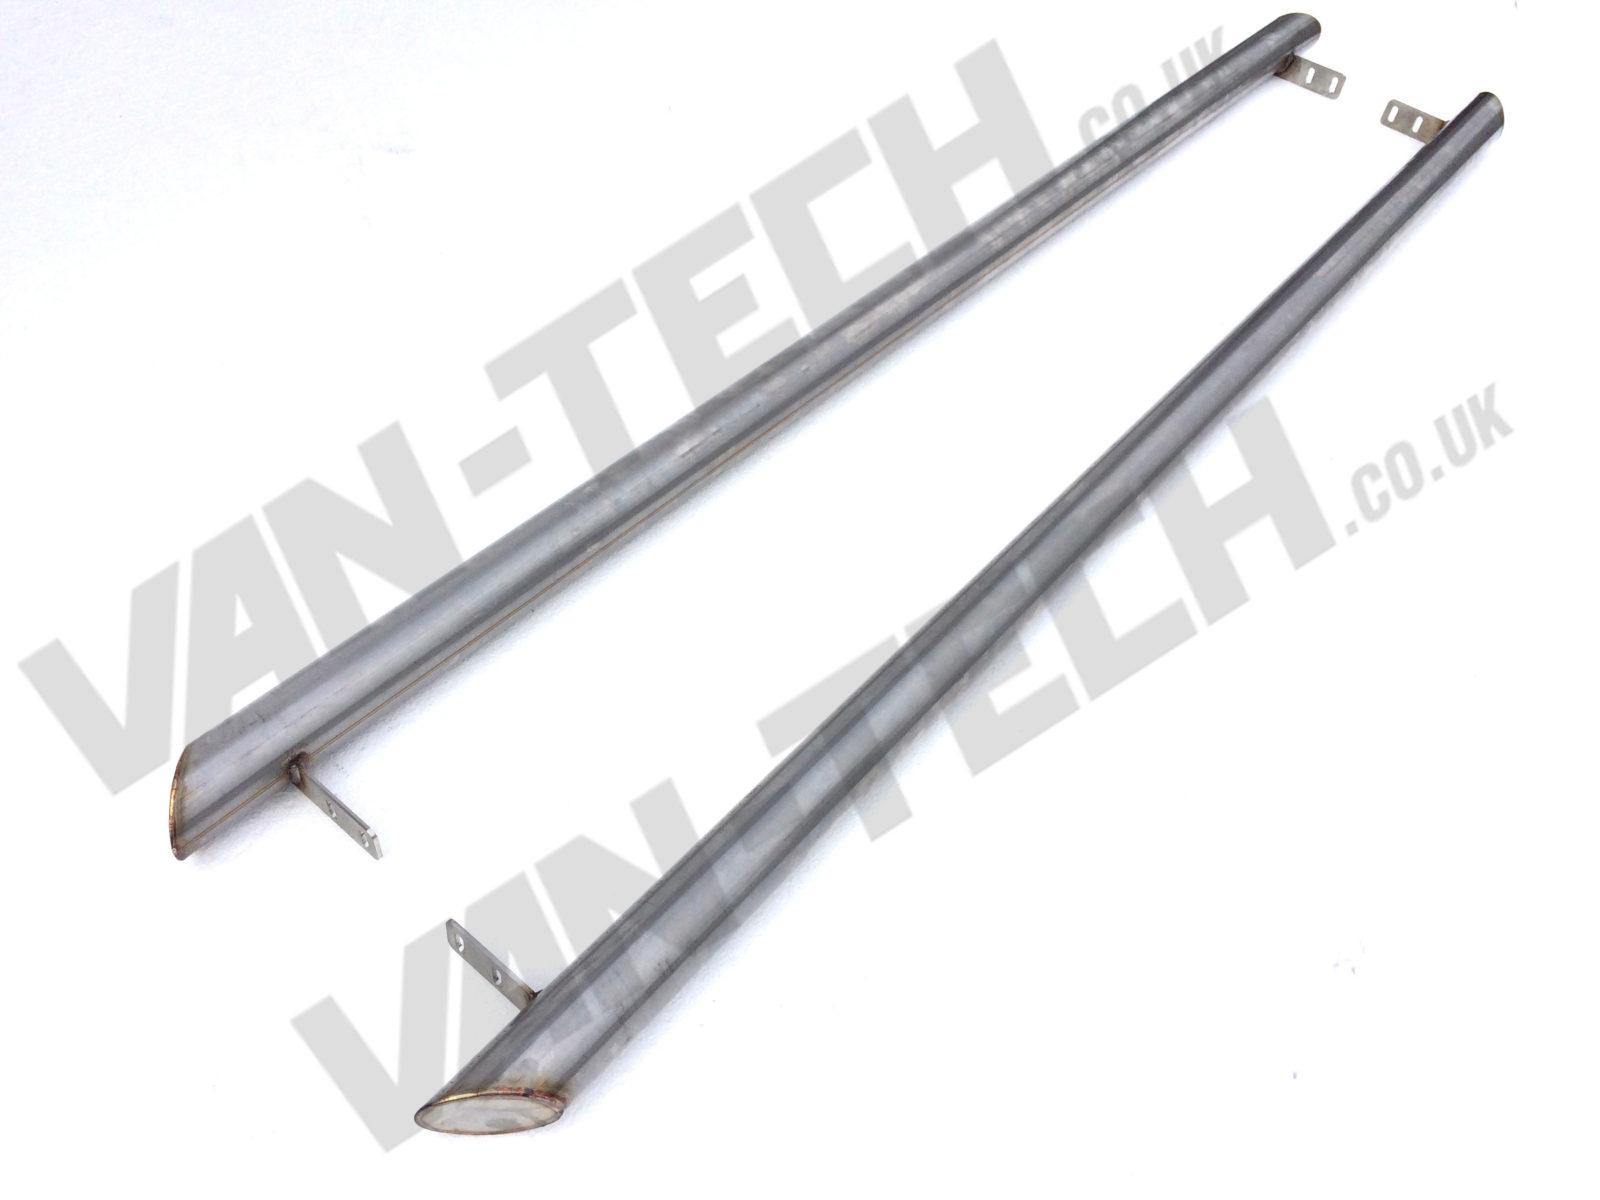 Saab Wiring Harness Repair Kit \u2022 Wiring Diagram For Free Toyota  Starter Repair Kit Toyota Wire Harness Repair Kit